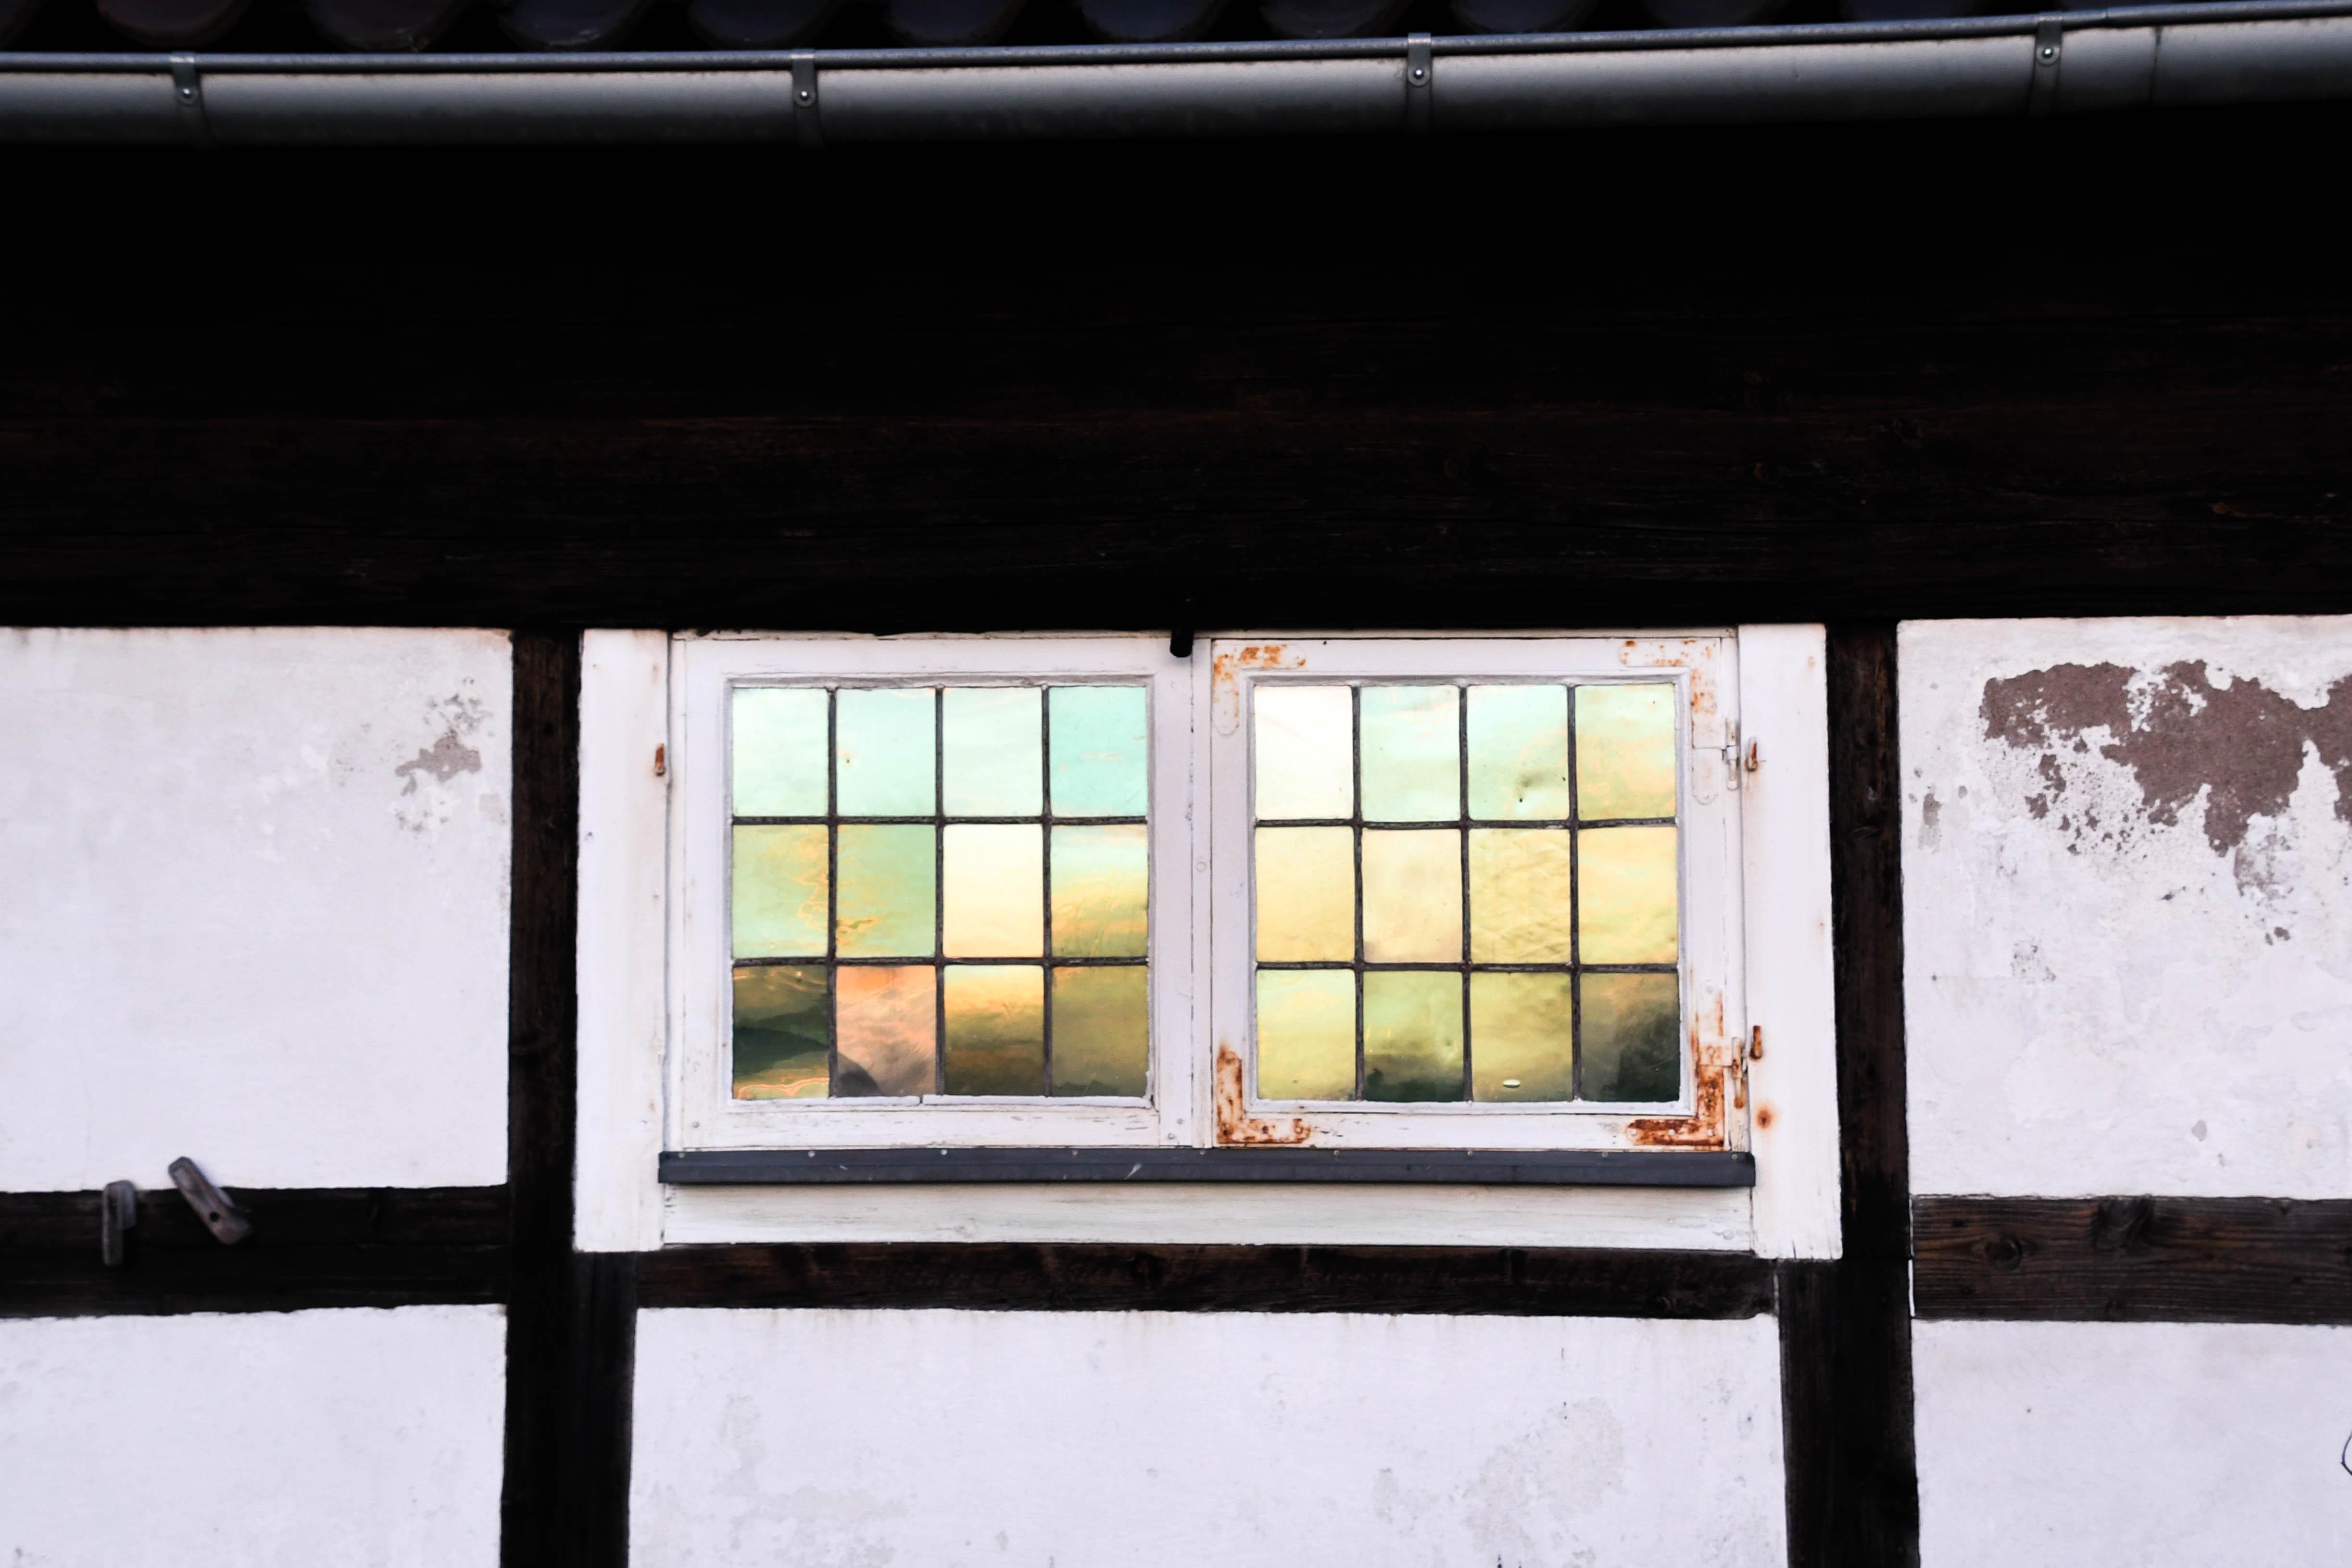 Windows Reflecting lights last shivering days of December